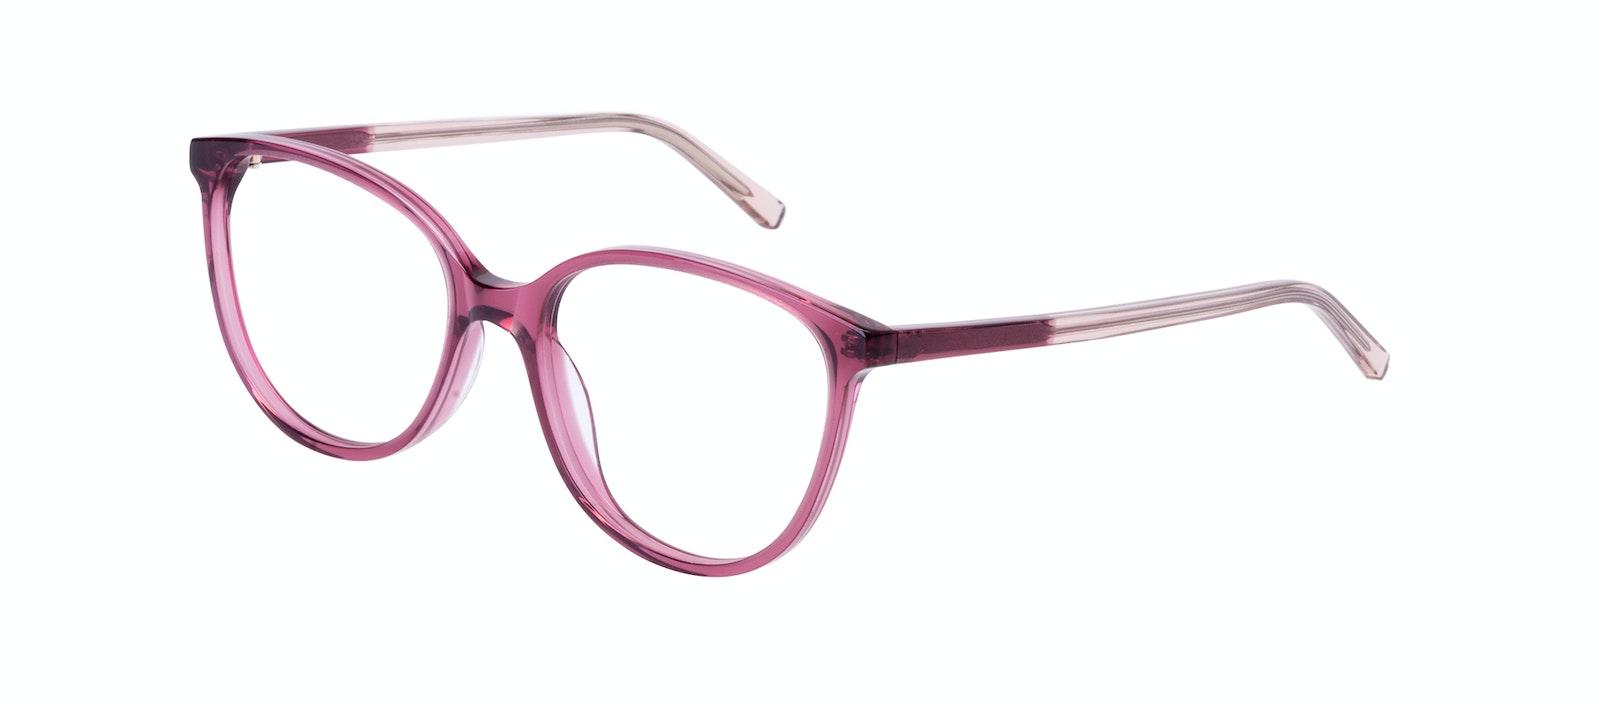 Affordable Fashion Glasses Round Eyeglasses Women Imagine Petite Berry Tilt